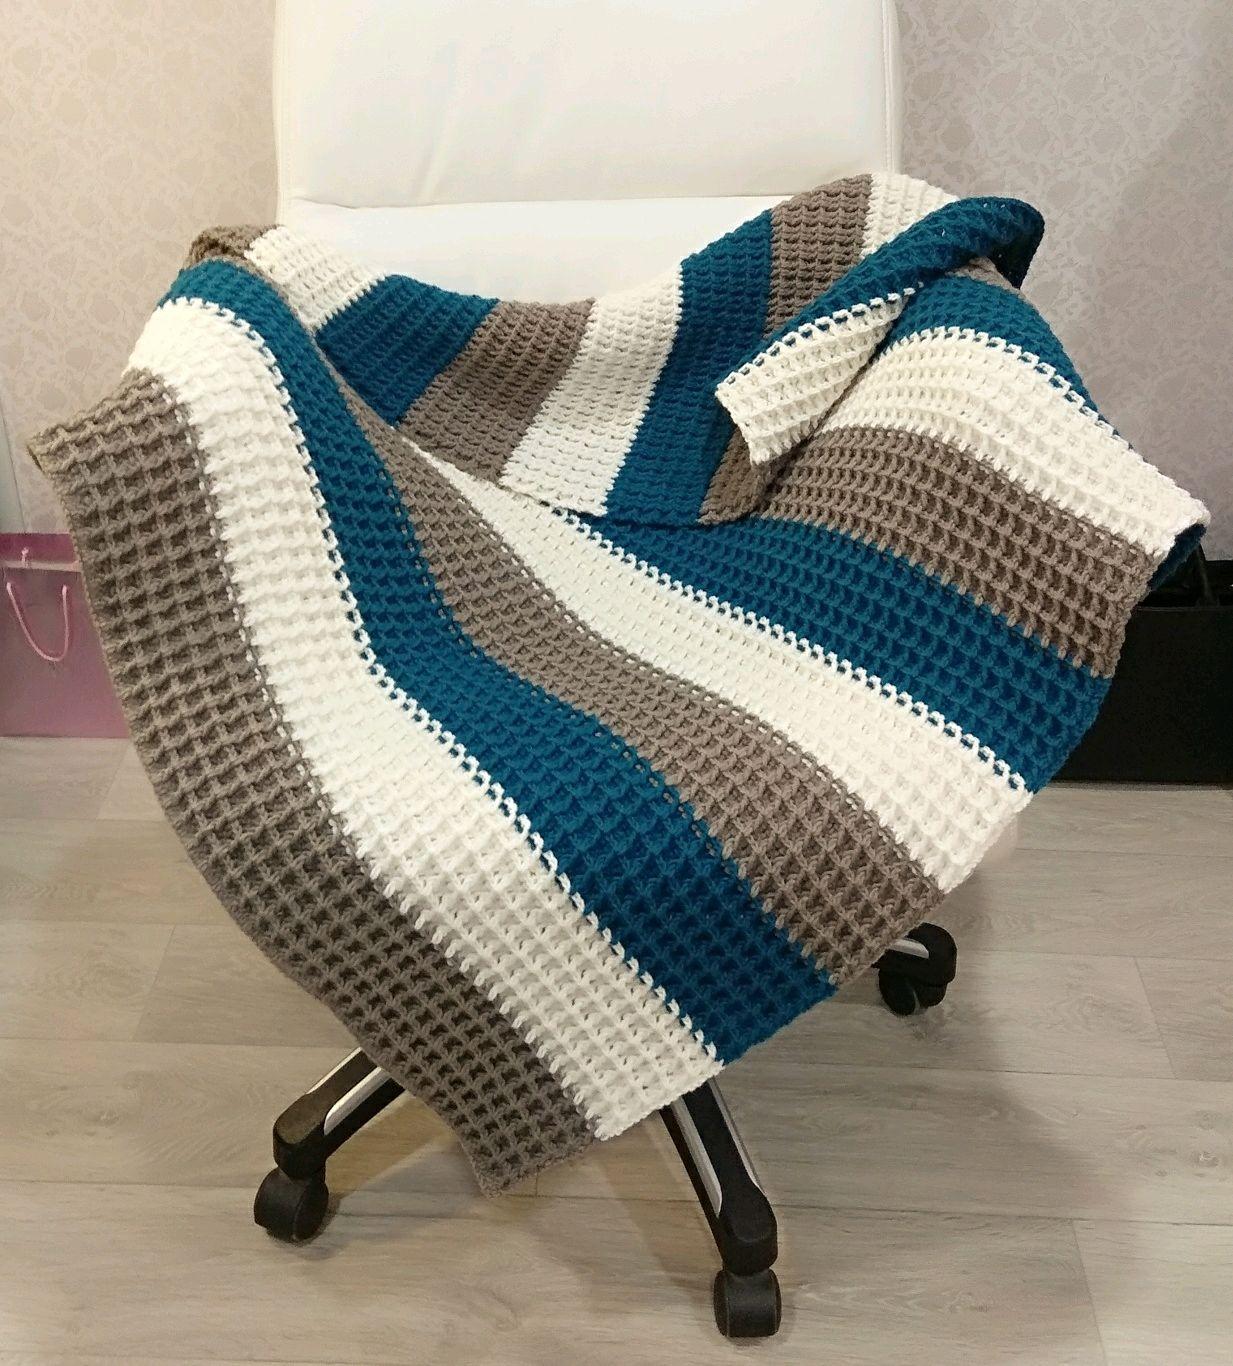 Basic & Standard Patterns for Boy Blanket Crochet Crochet Ba Blanket Ba Boy Blanket Newborn Gift Ba Boy Gift